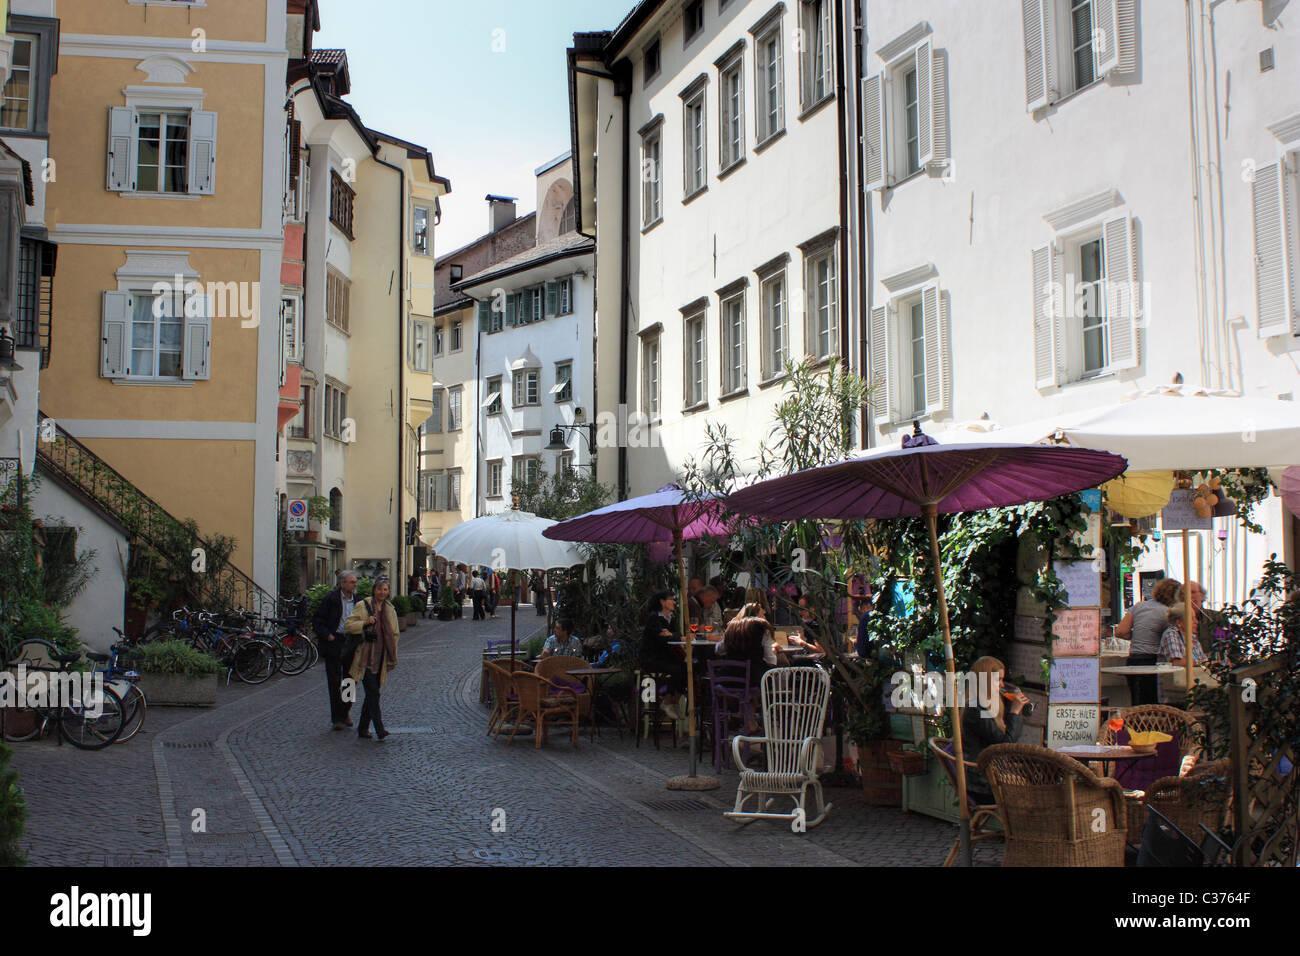 Wine bar and restaurant Fischbänke in Bozen / Bolzano, Italy - Stock Image